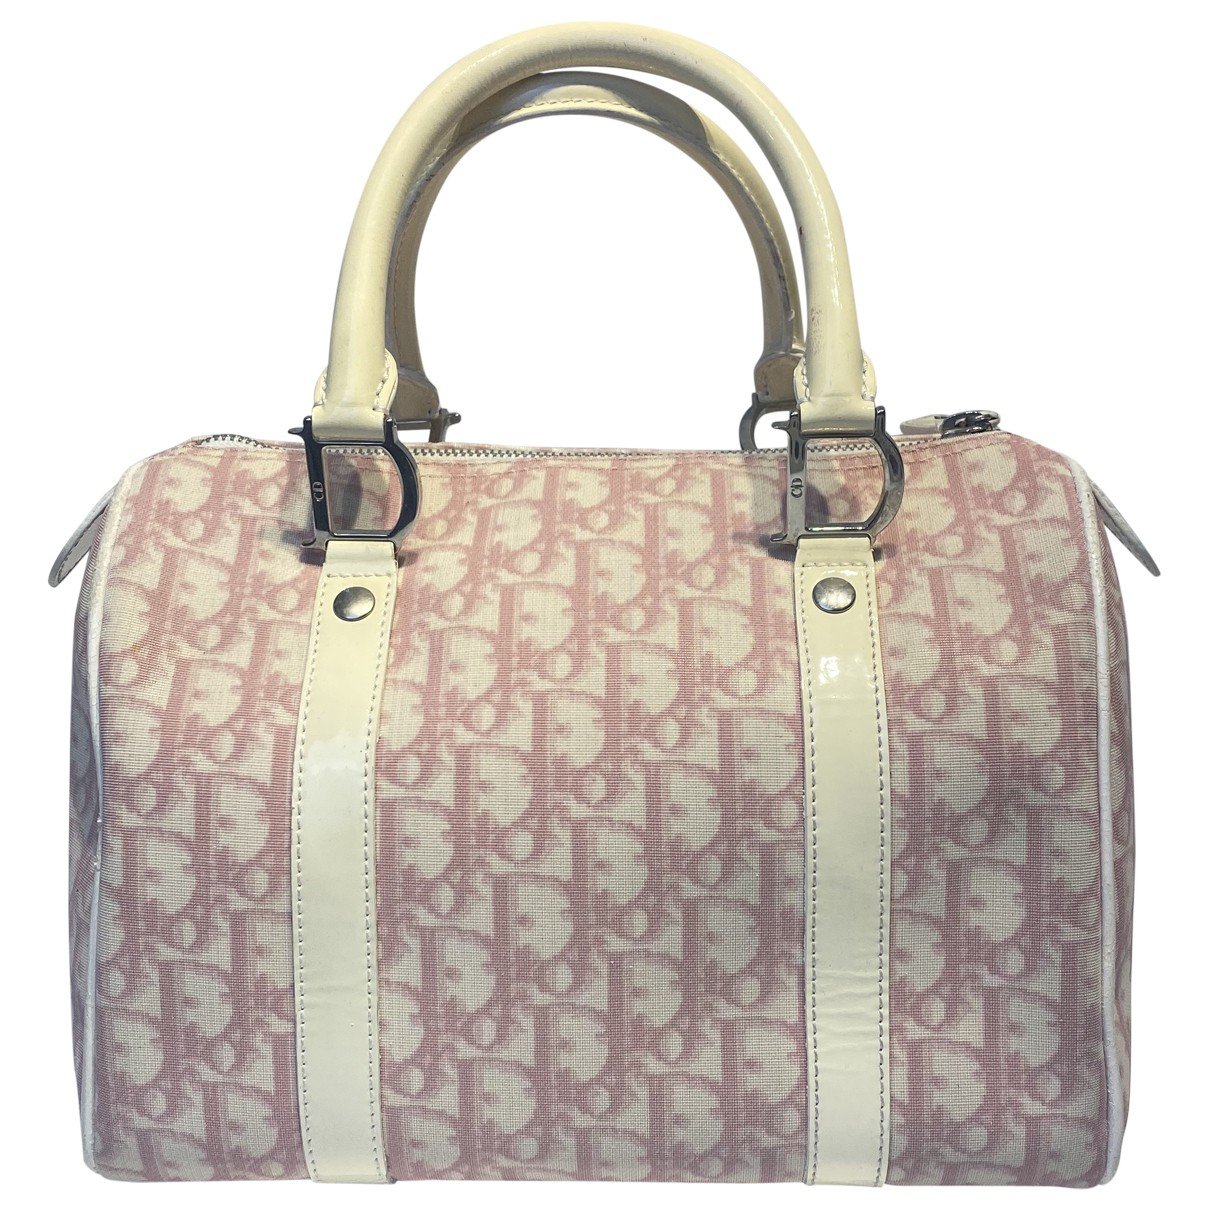 Dior - Sac a main Bowling pour femme en toile - rose